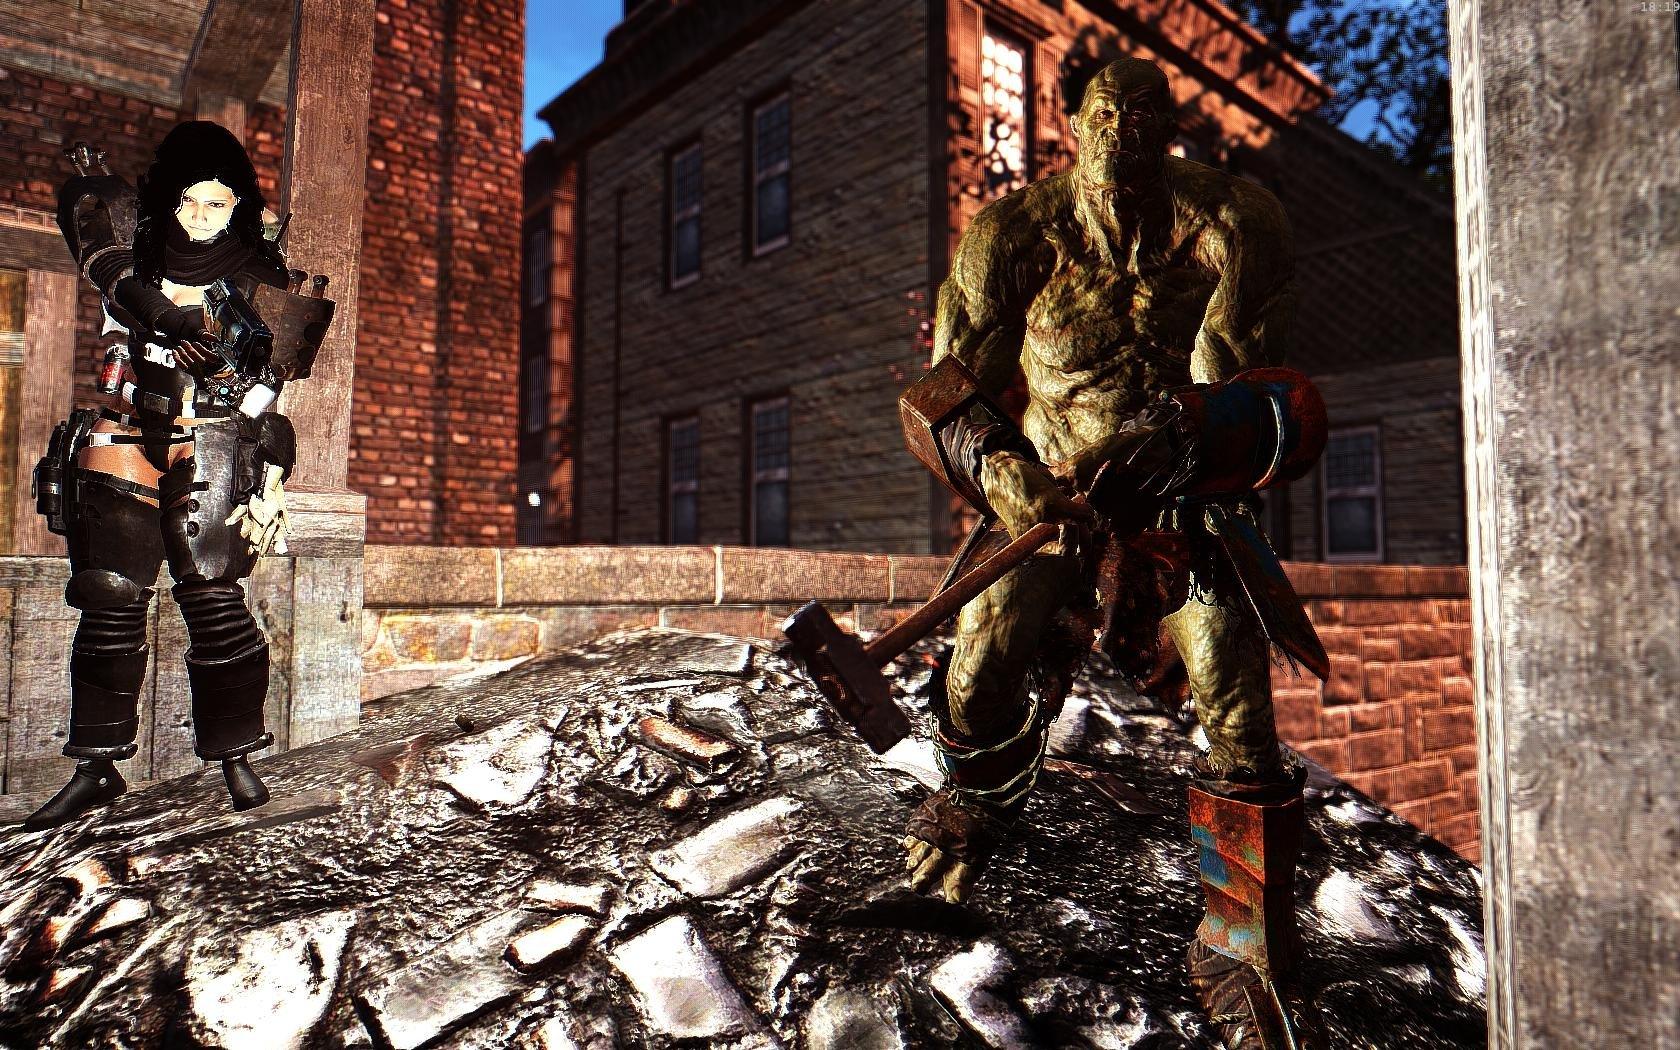 Fallout4 2018-10-27 18-19-16-02.jpg